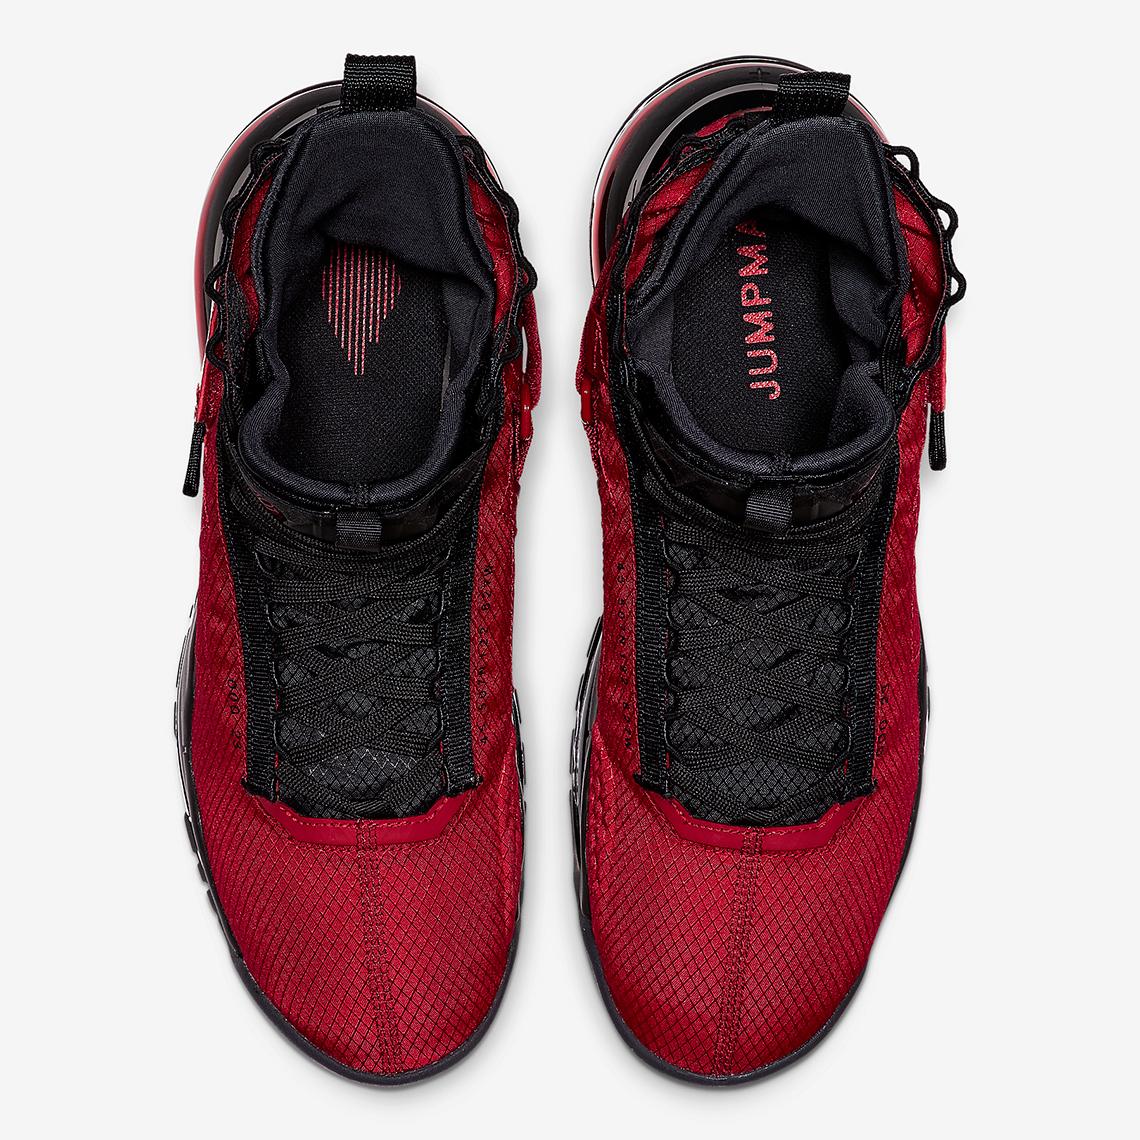 Jordan Proto Max 720 Red + Black BQ6623-600 Info  e8a82a64e